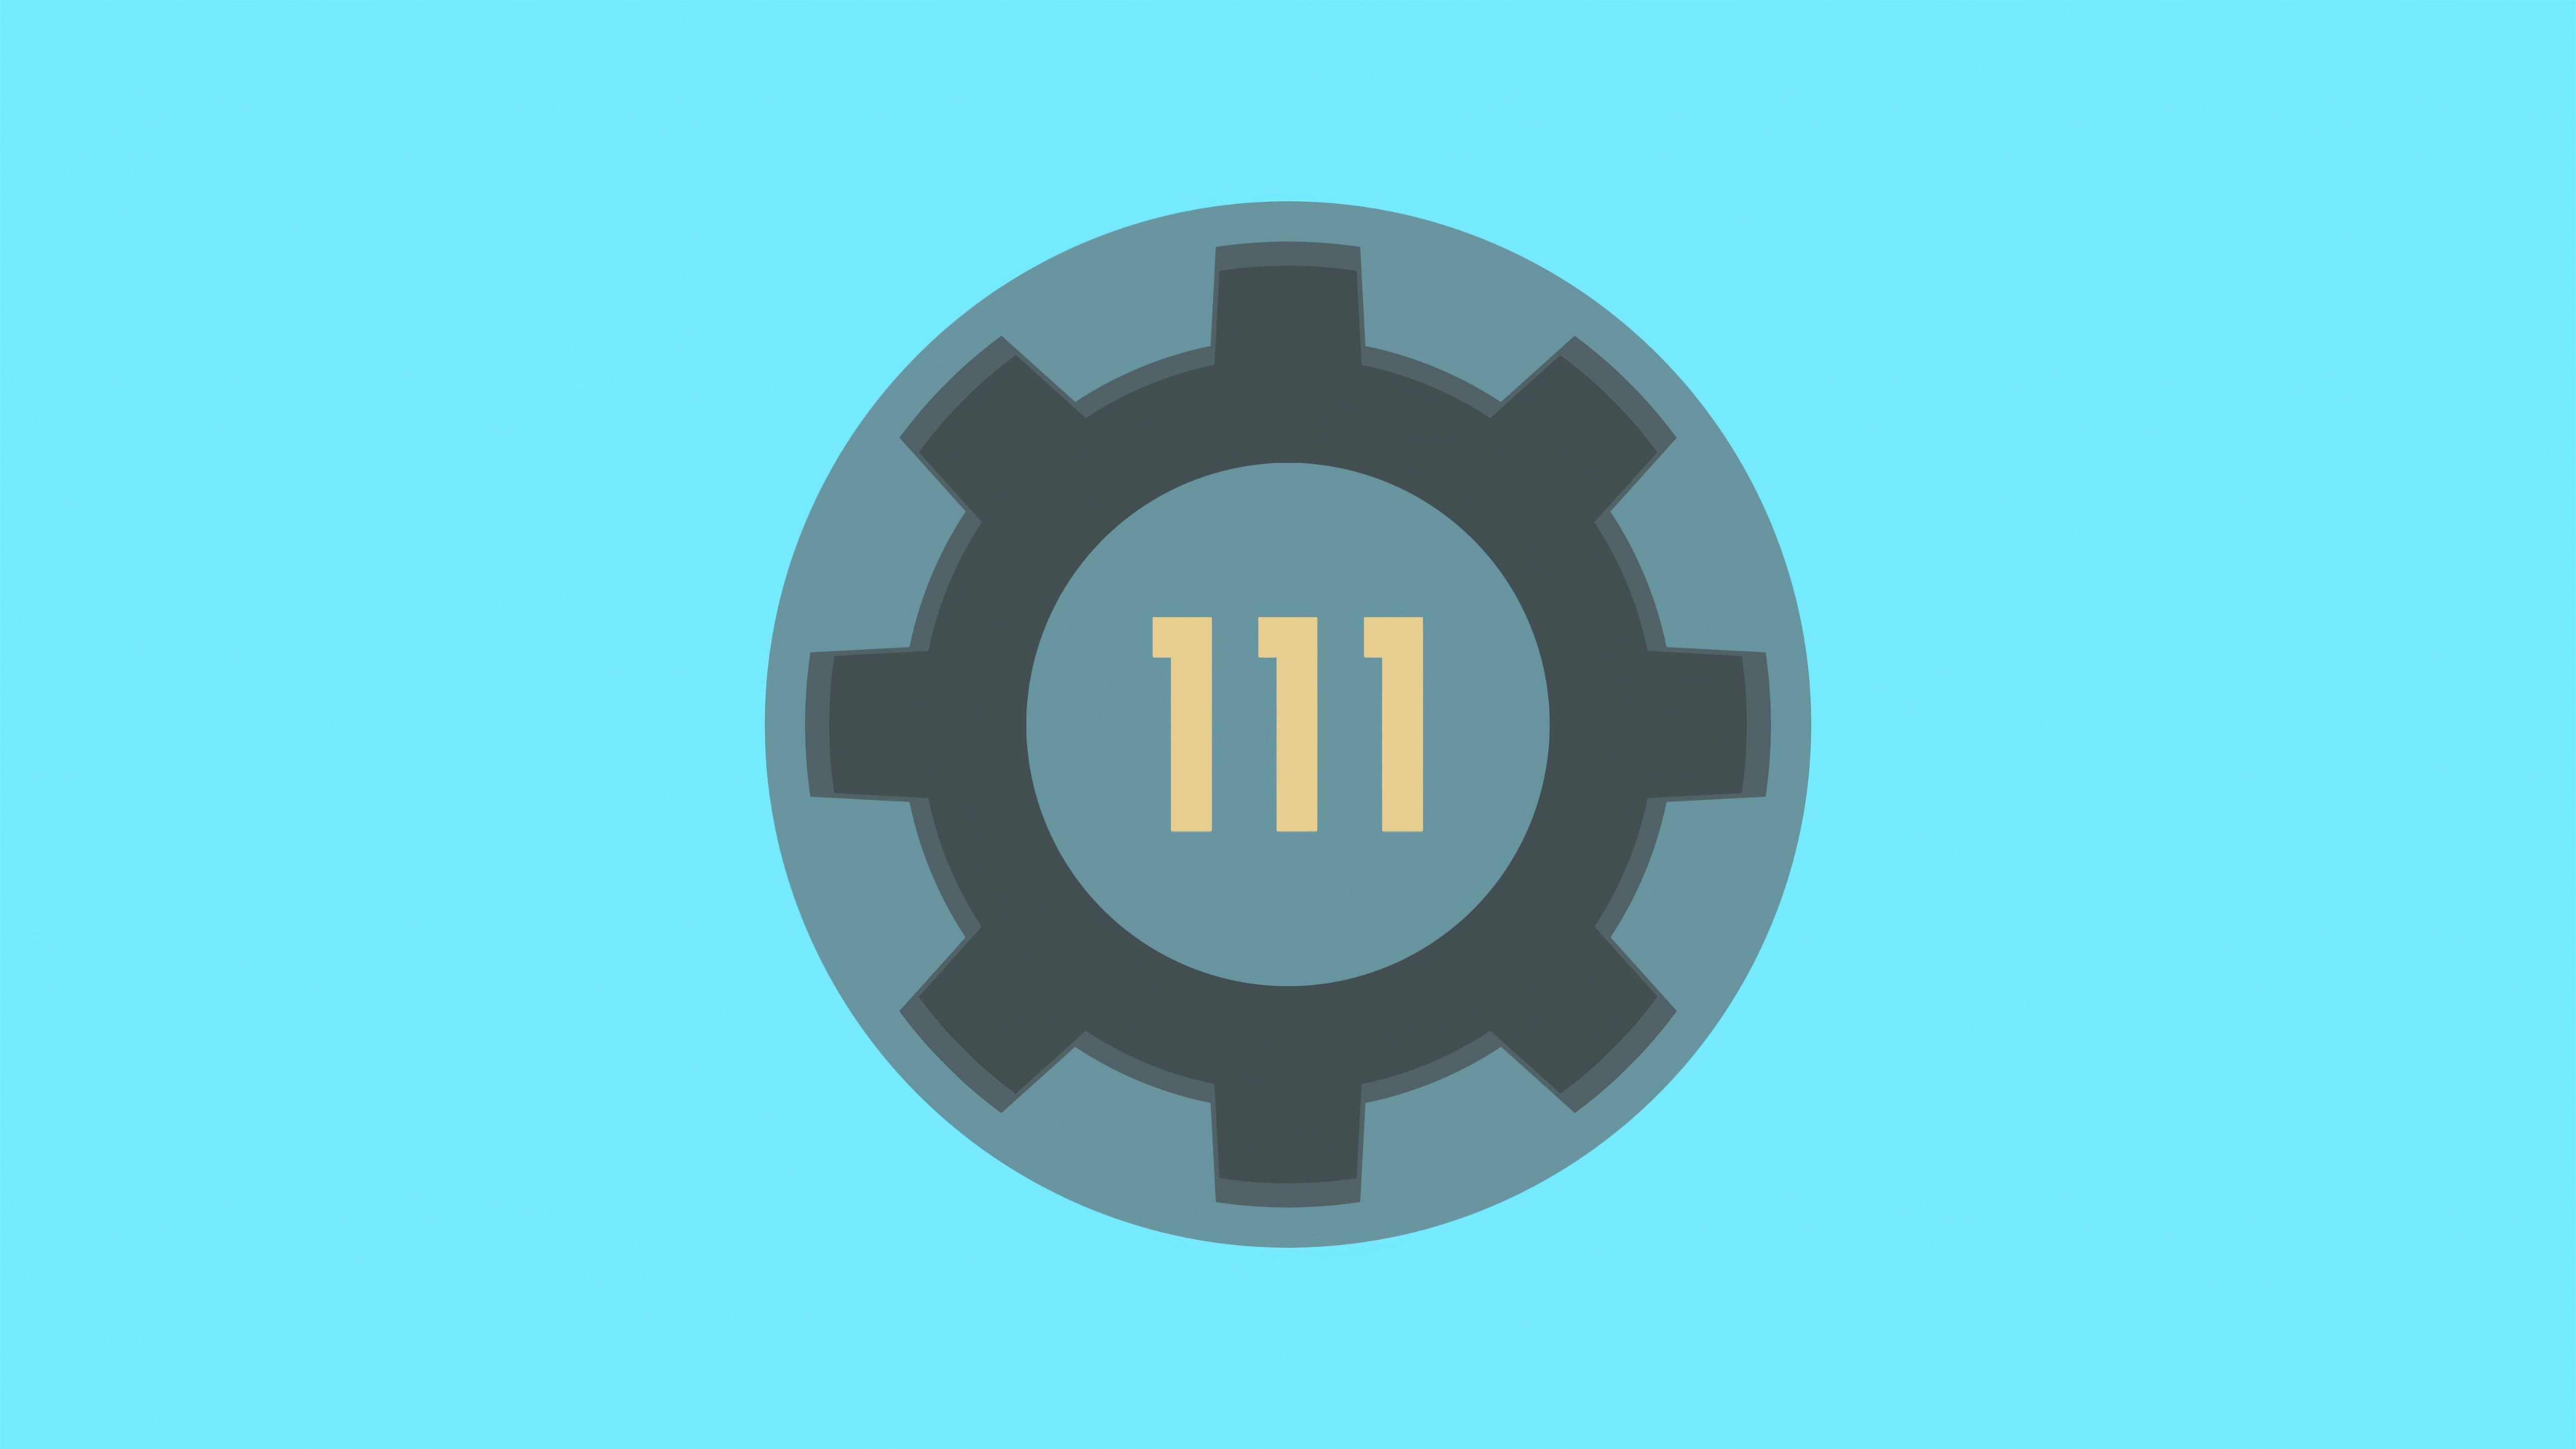 fallout 3 vault 111 minimal 4k 1618136886 - Fallout 3 Vault 111 Minimal 4k - Fallout 3 Vault 111 Minimal 4k wallpapers